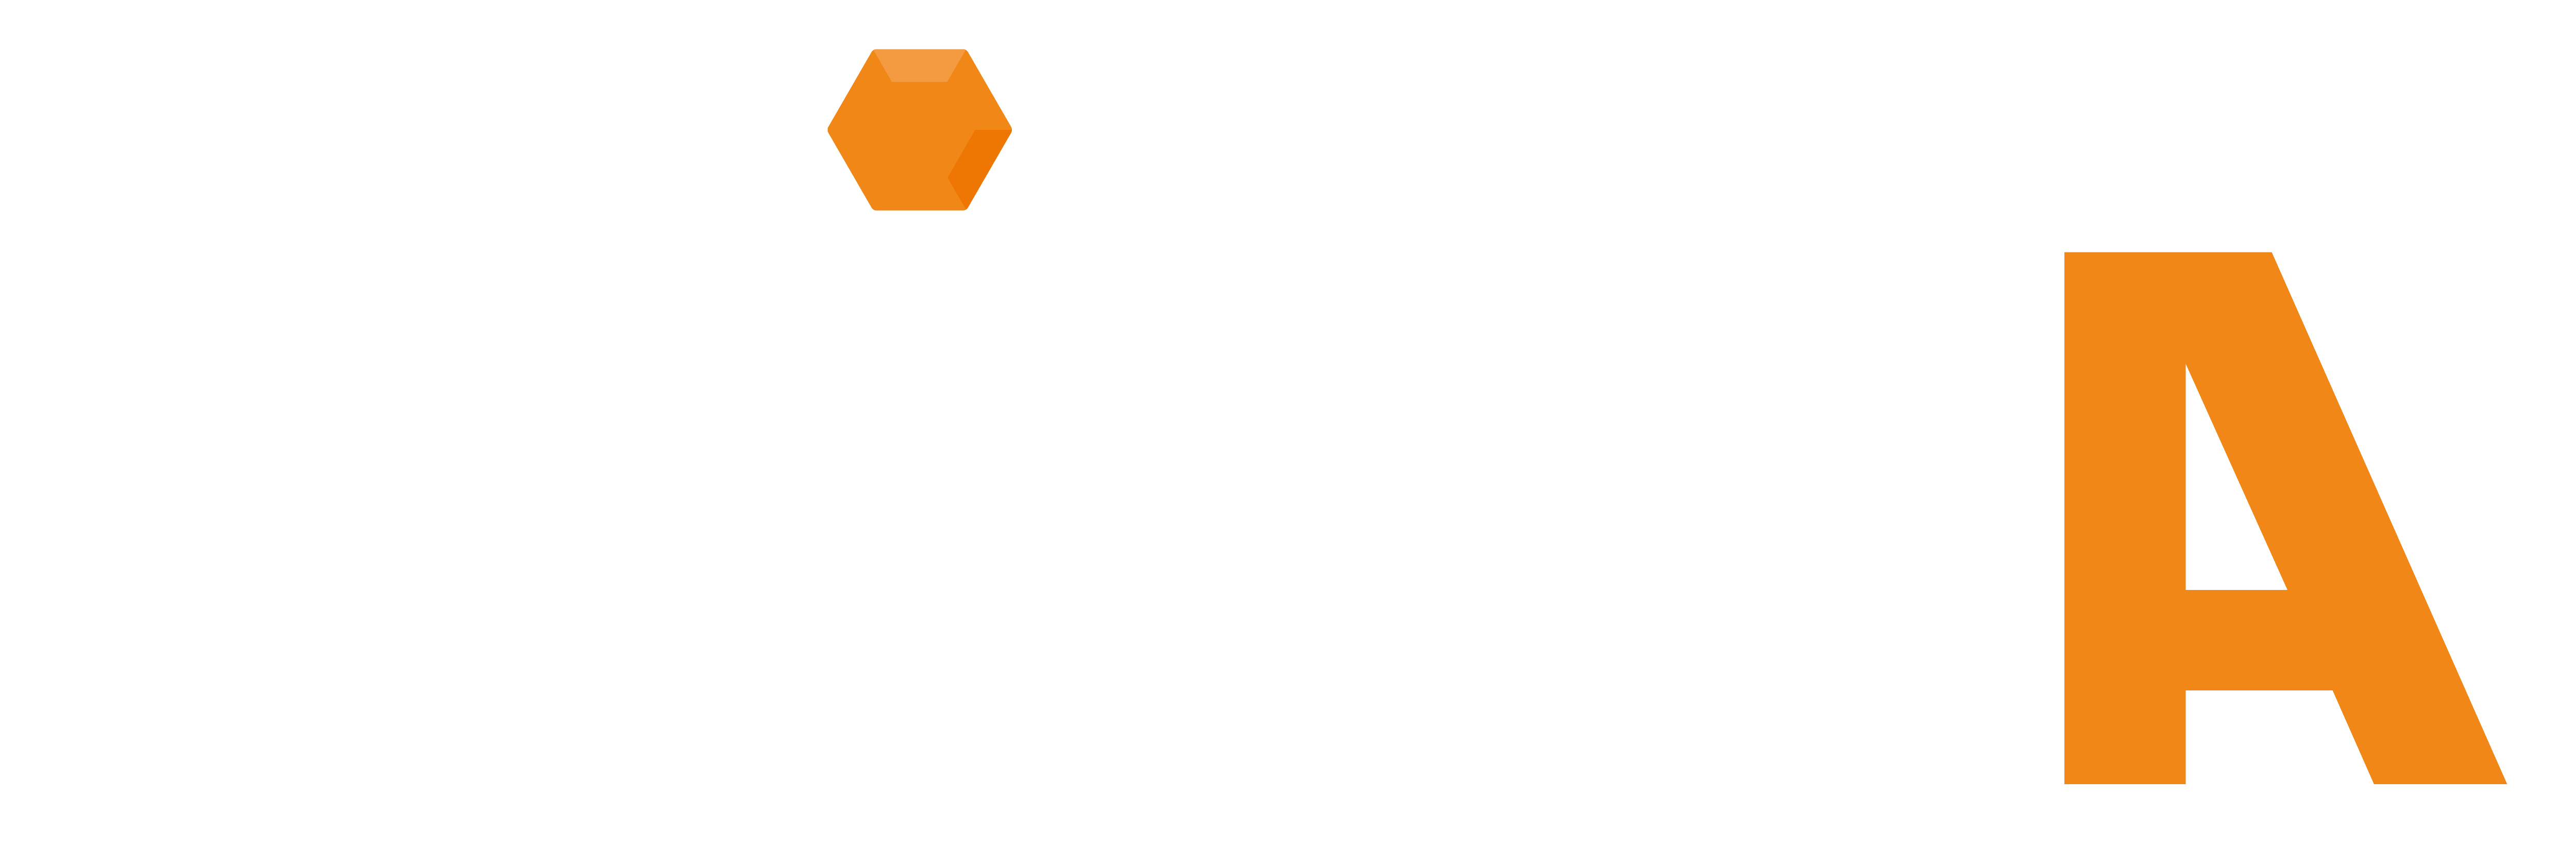 Minea logo adspy